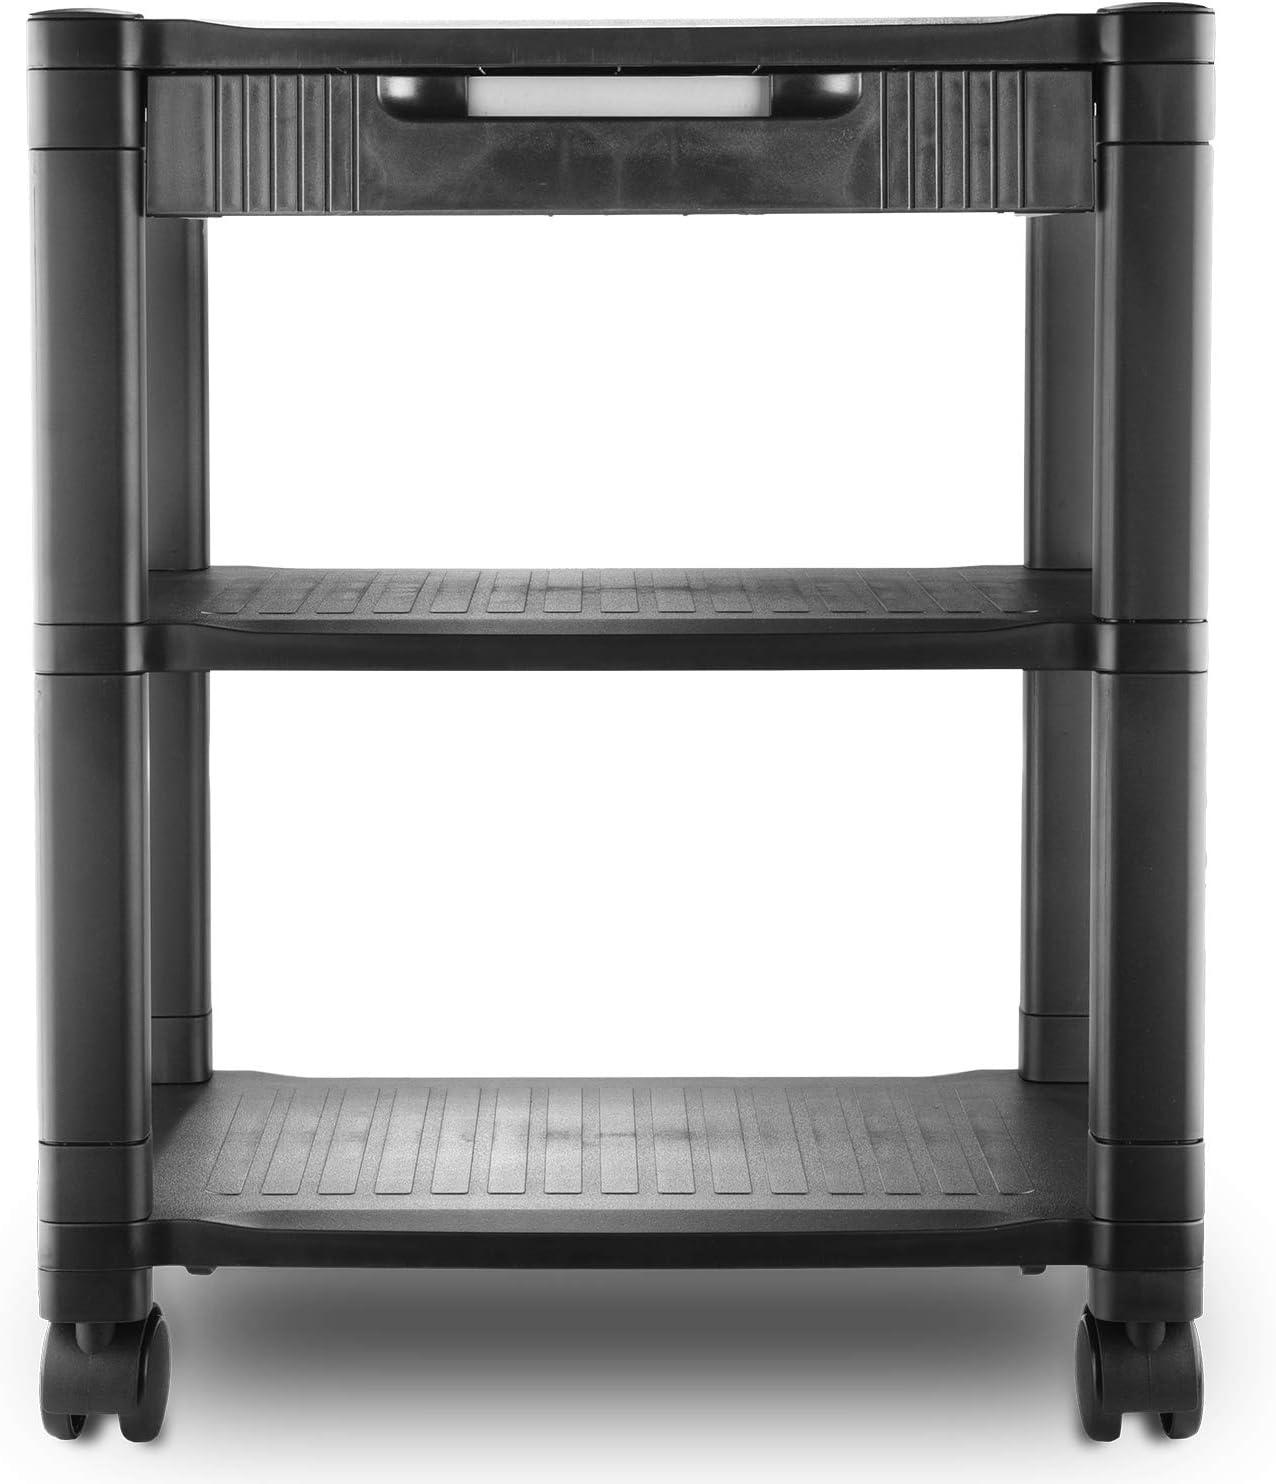 Amazon.com: Circuit City PS3T - Soporte de 3 estantes para ...